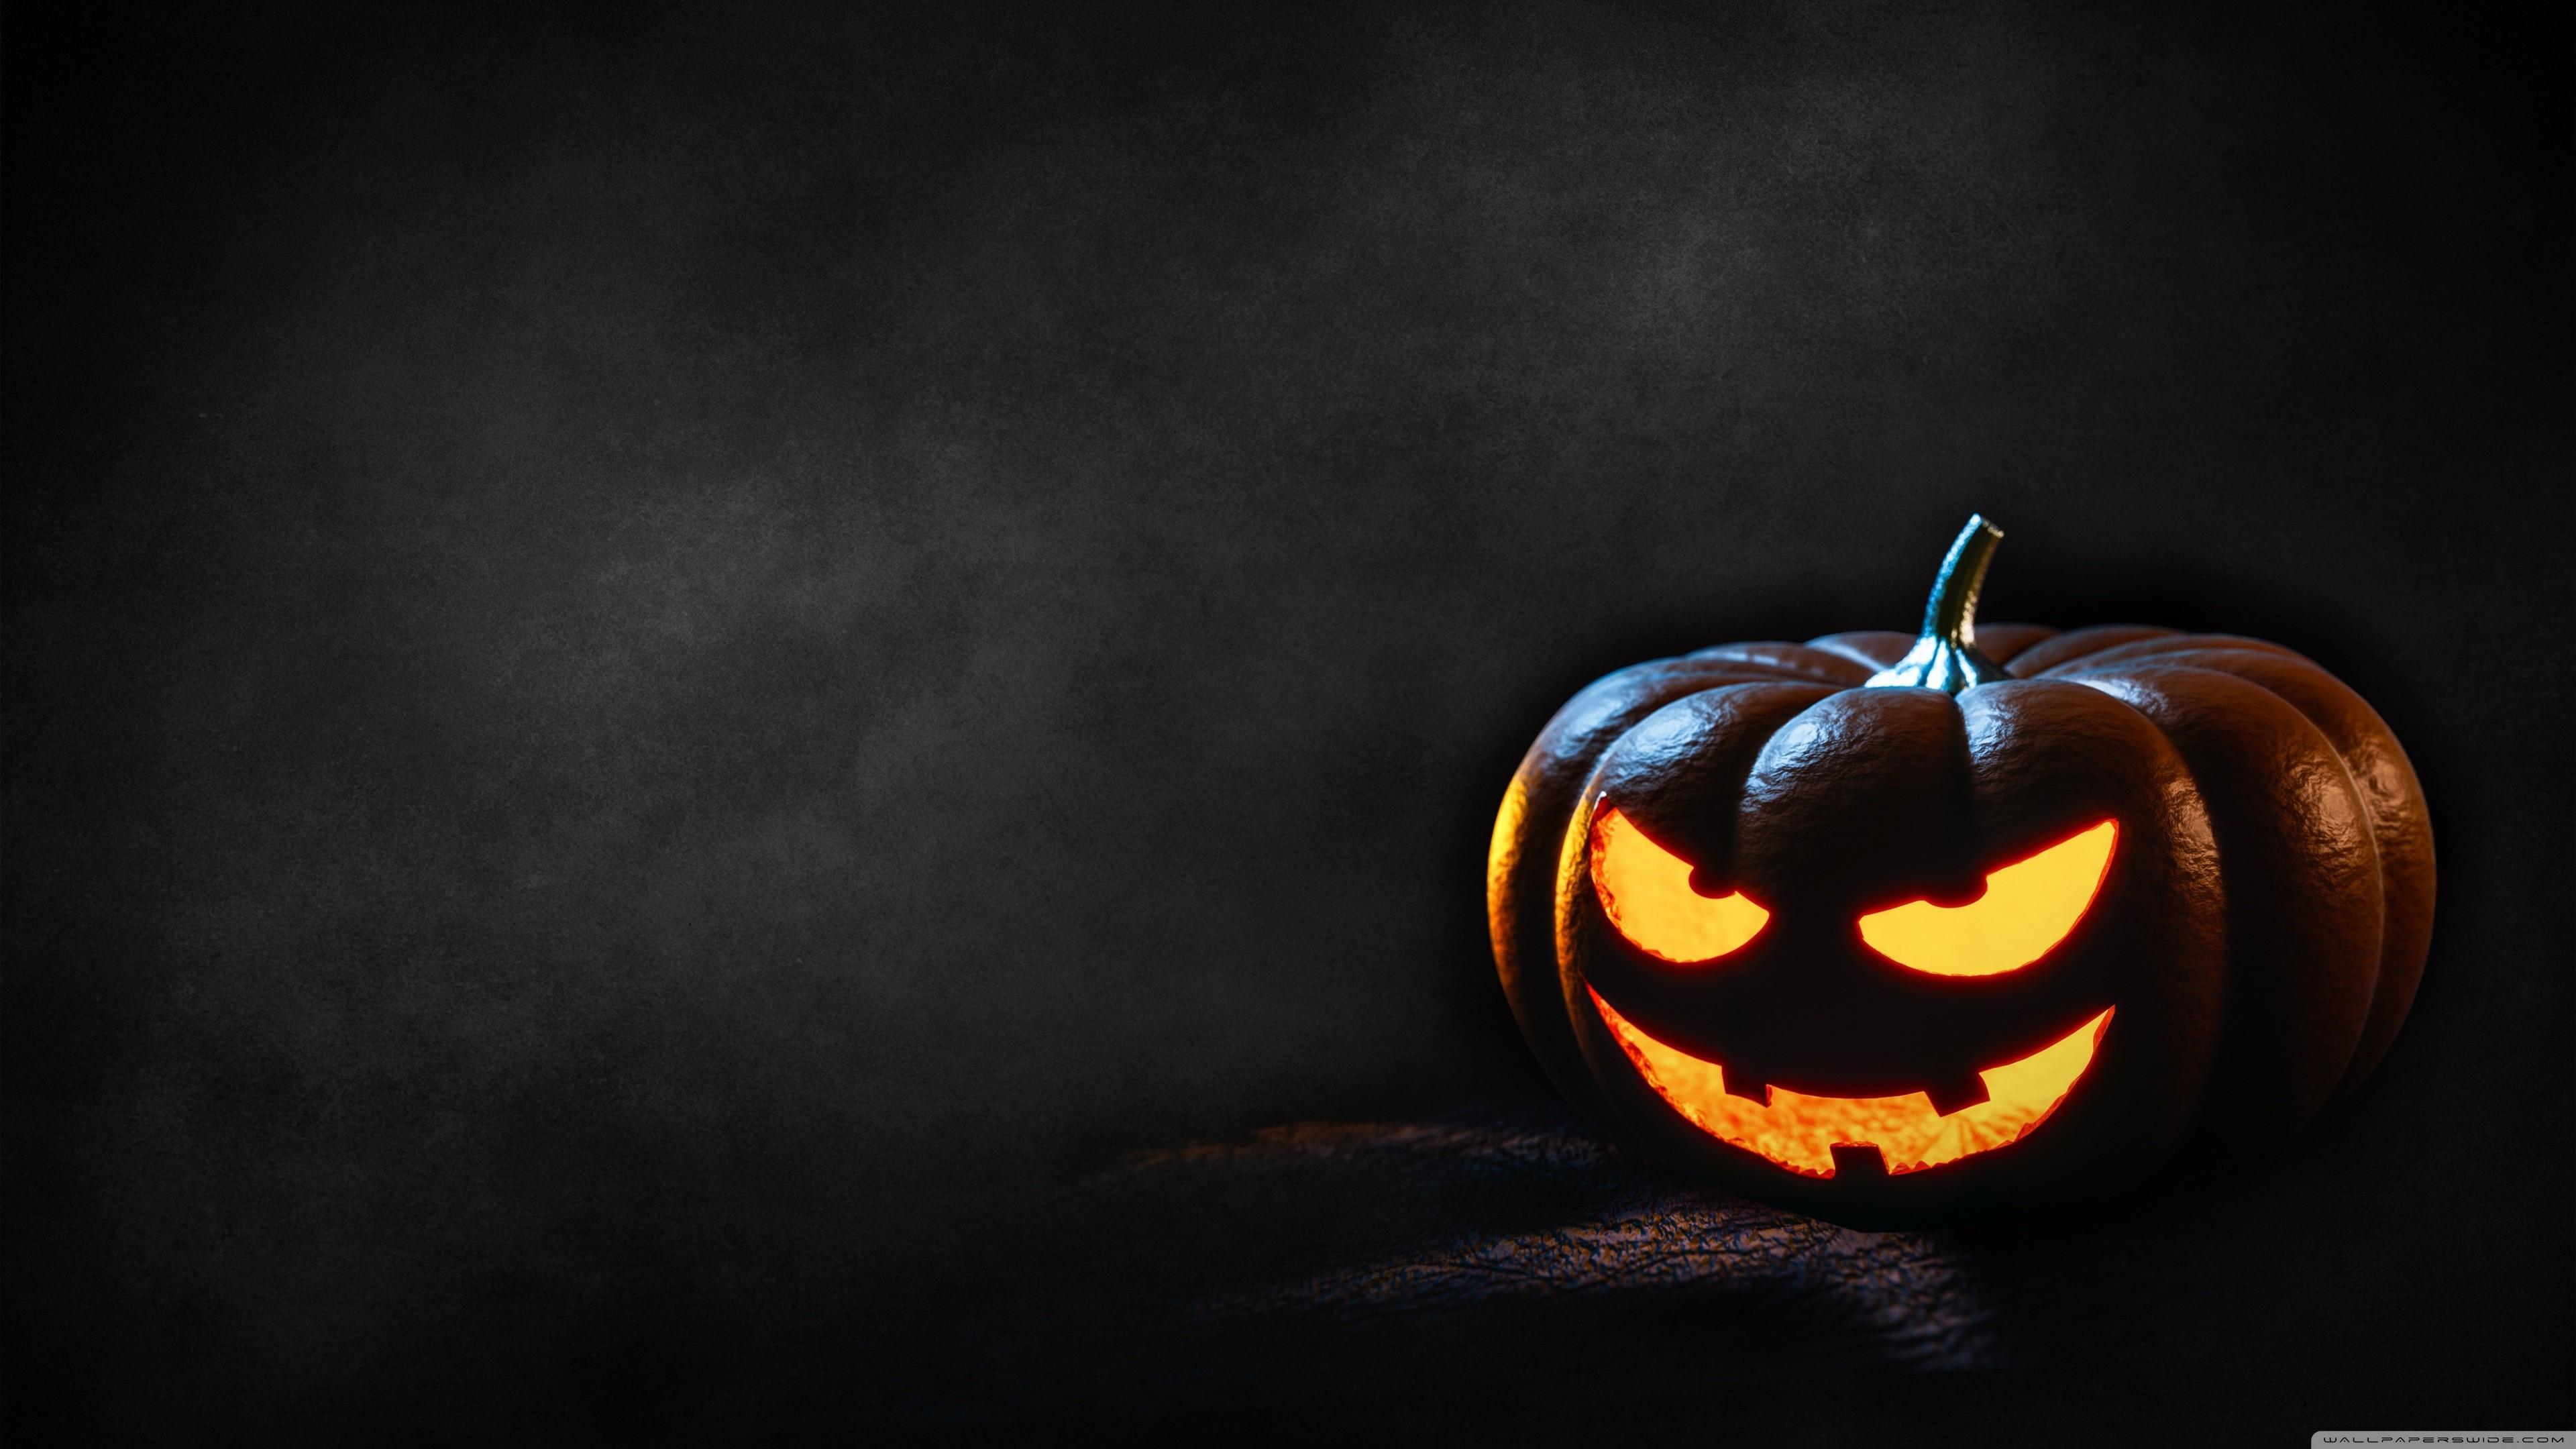 Cute Halloween Desktop Wallpaper ·① WallpaperTag